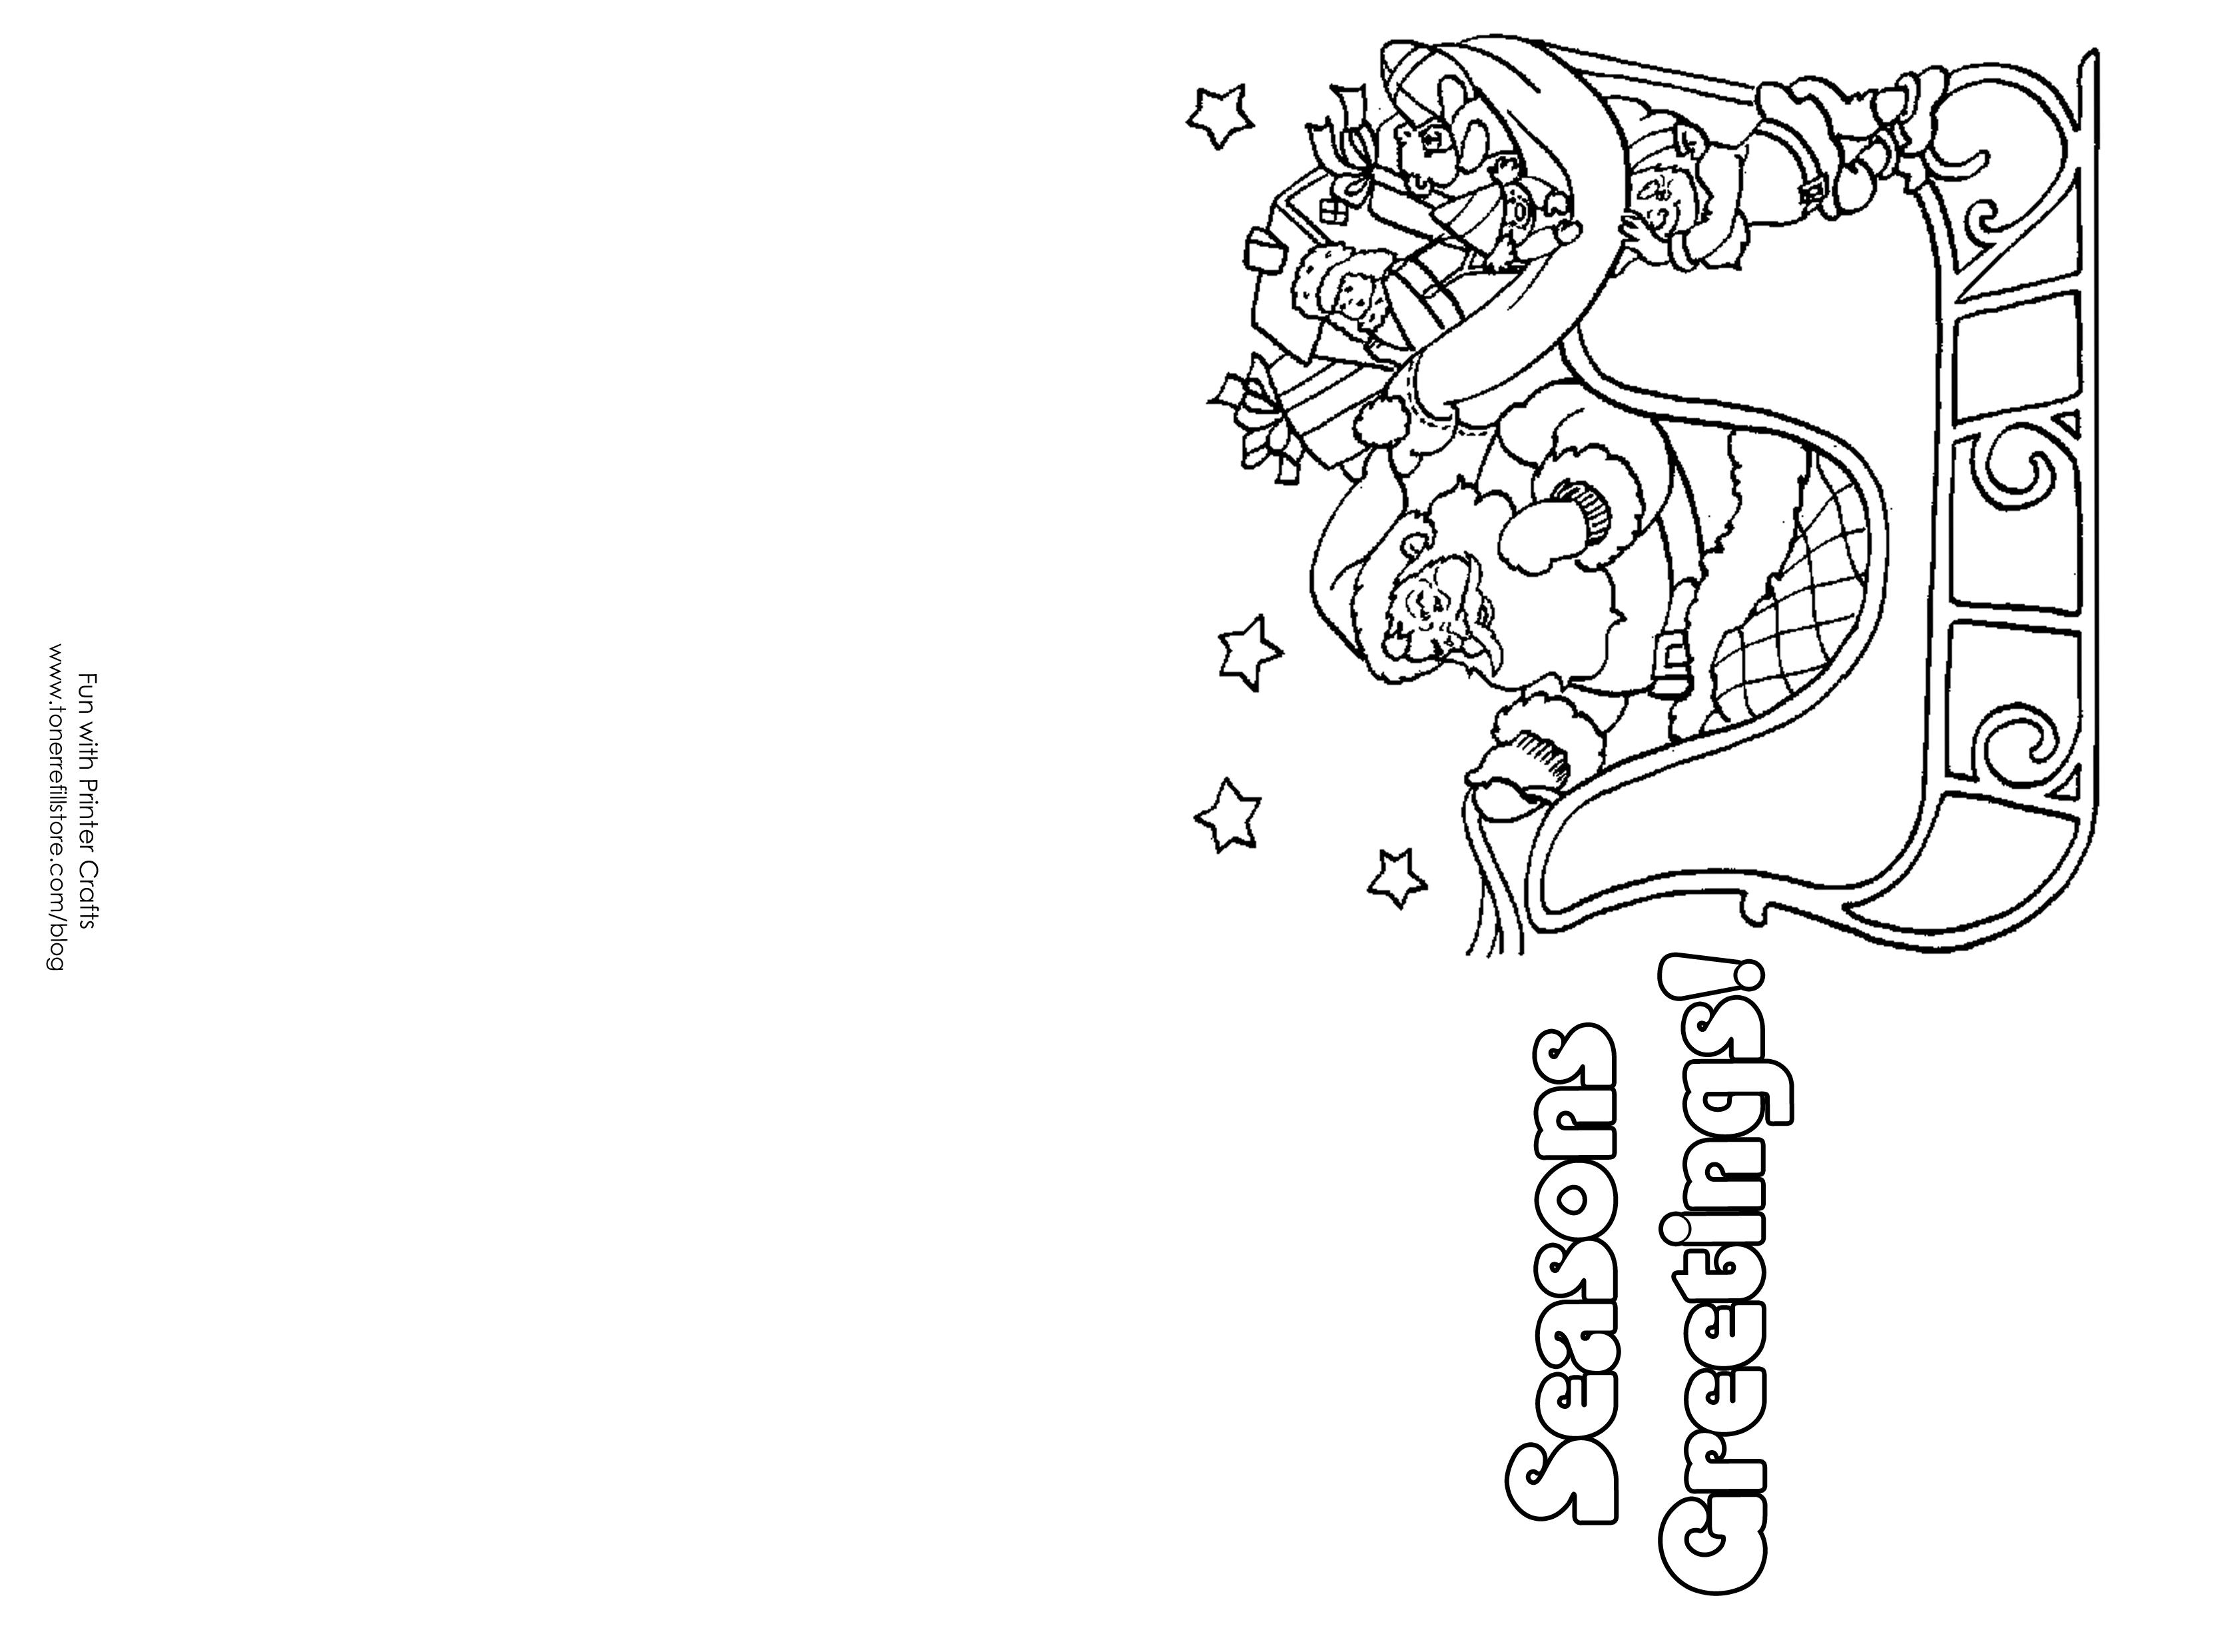 christmas cards coloring sheets wonderland crafts greeting cards sheets cards coloring christmas